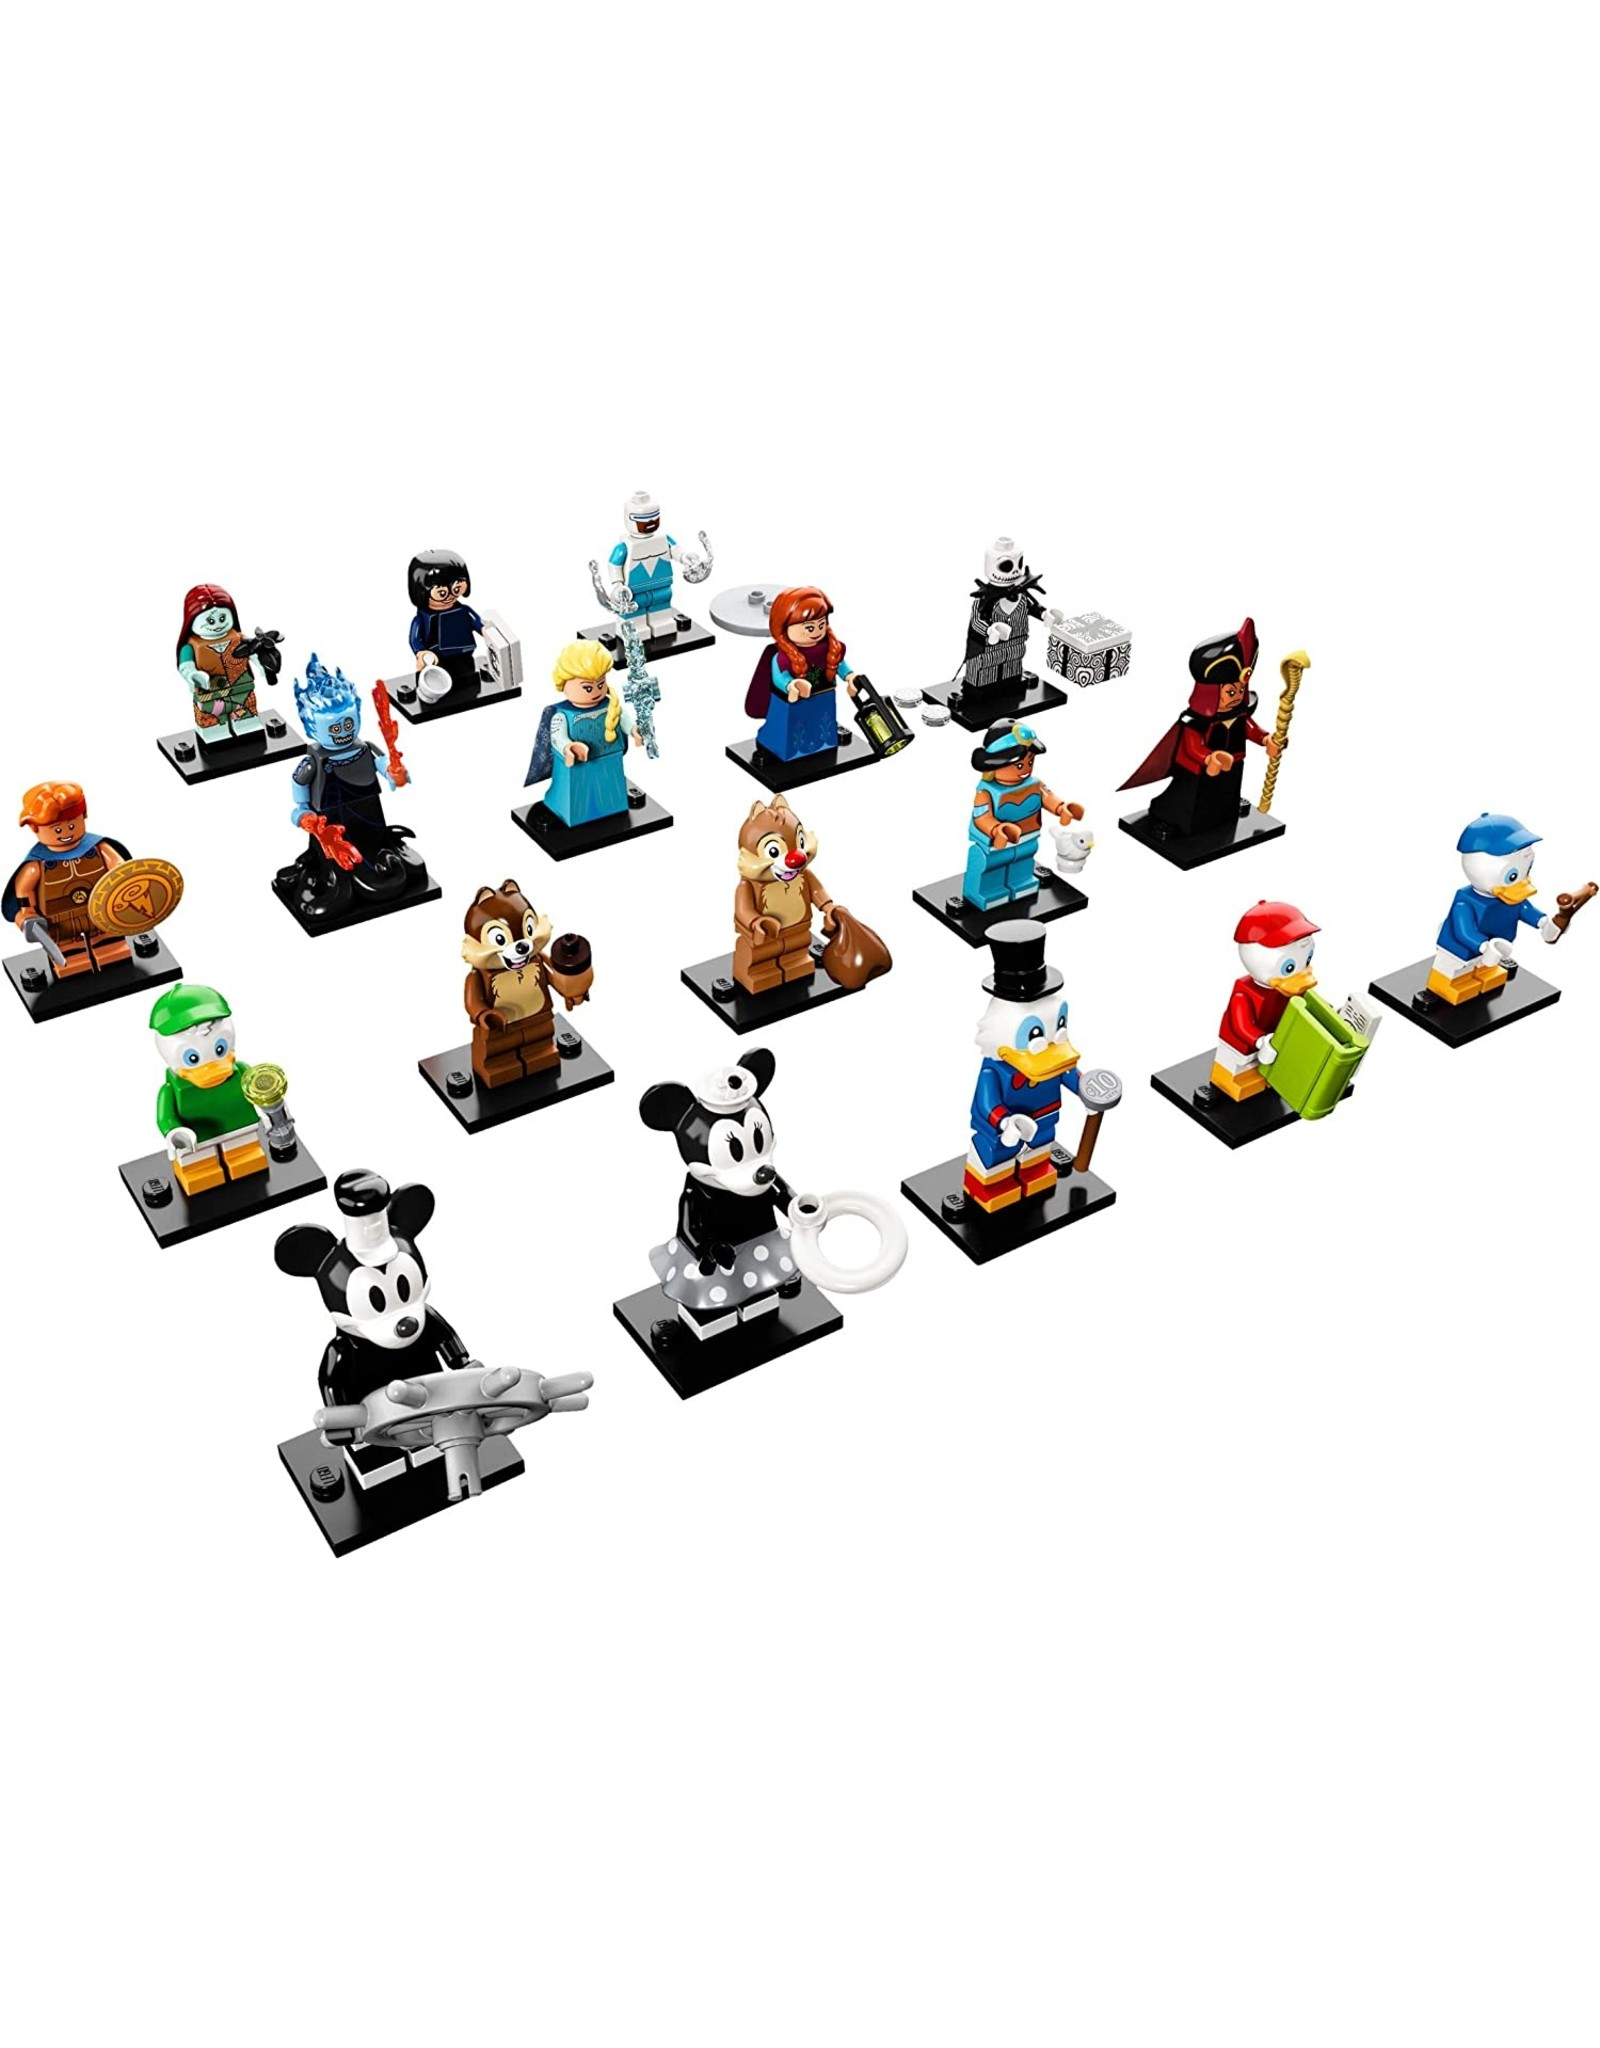 LEGO 71024 Minifigures  Disney Series 2